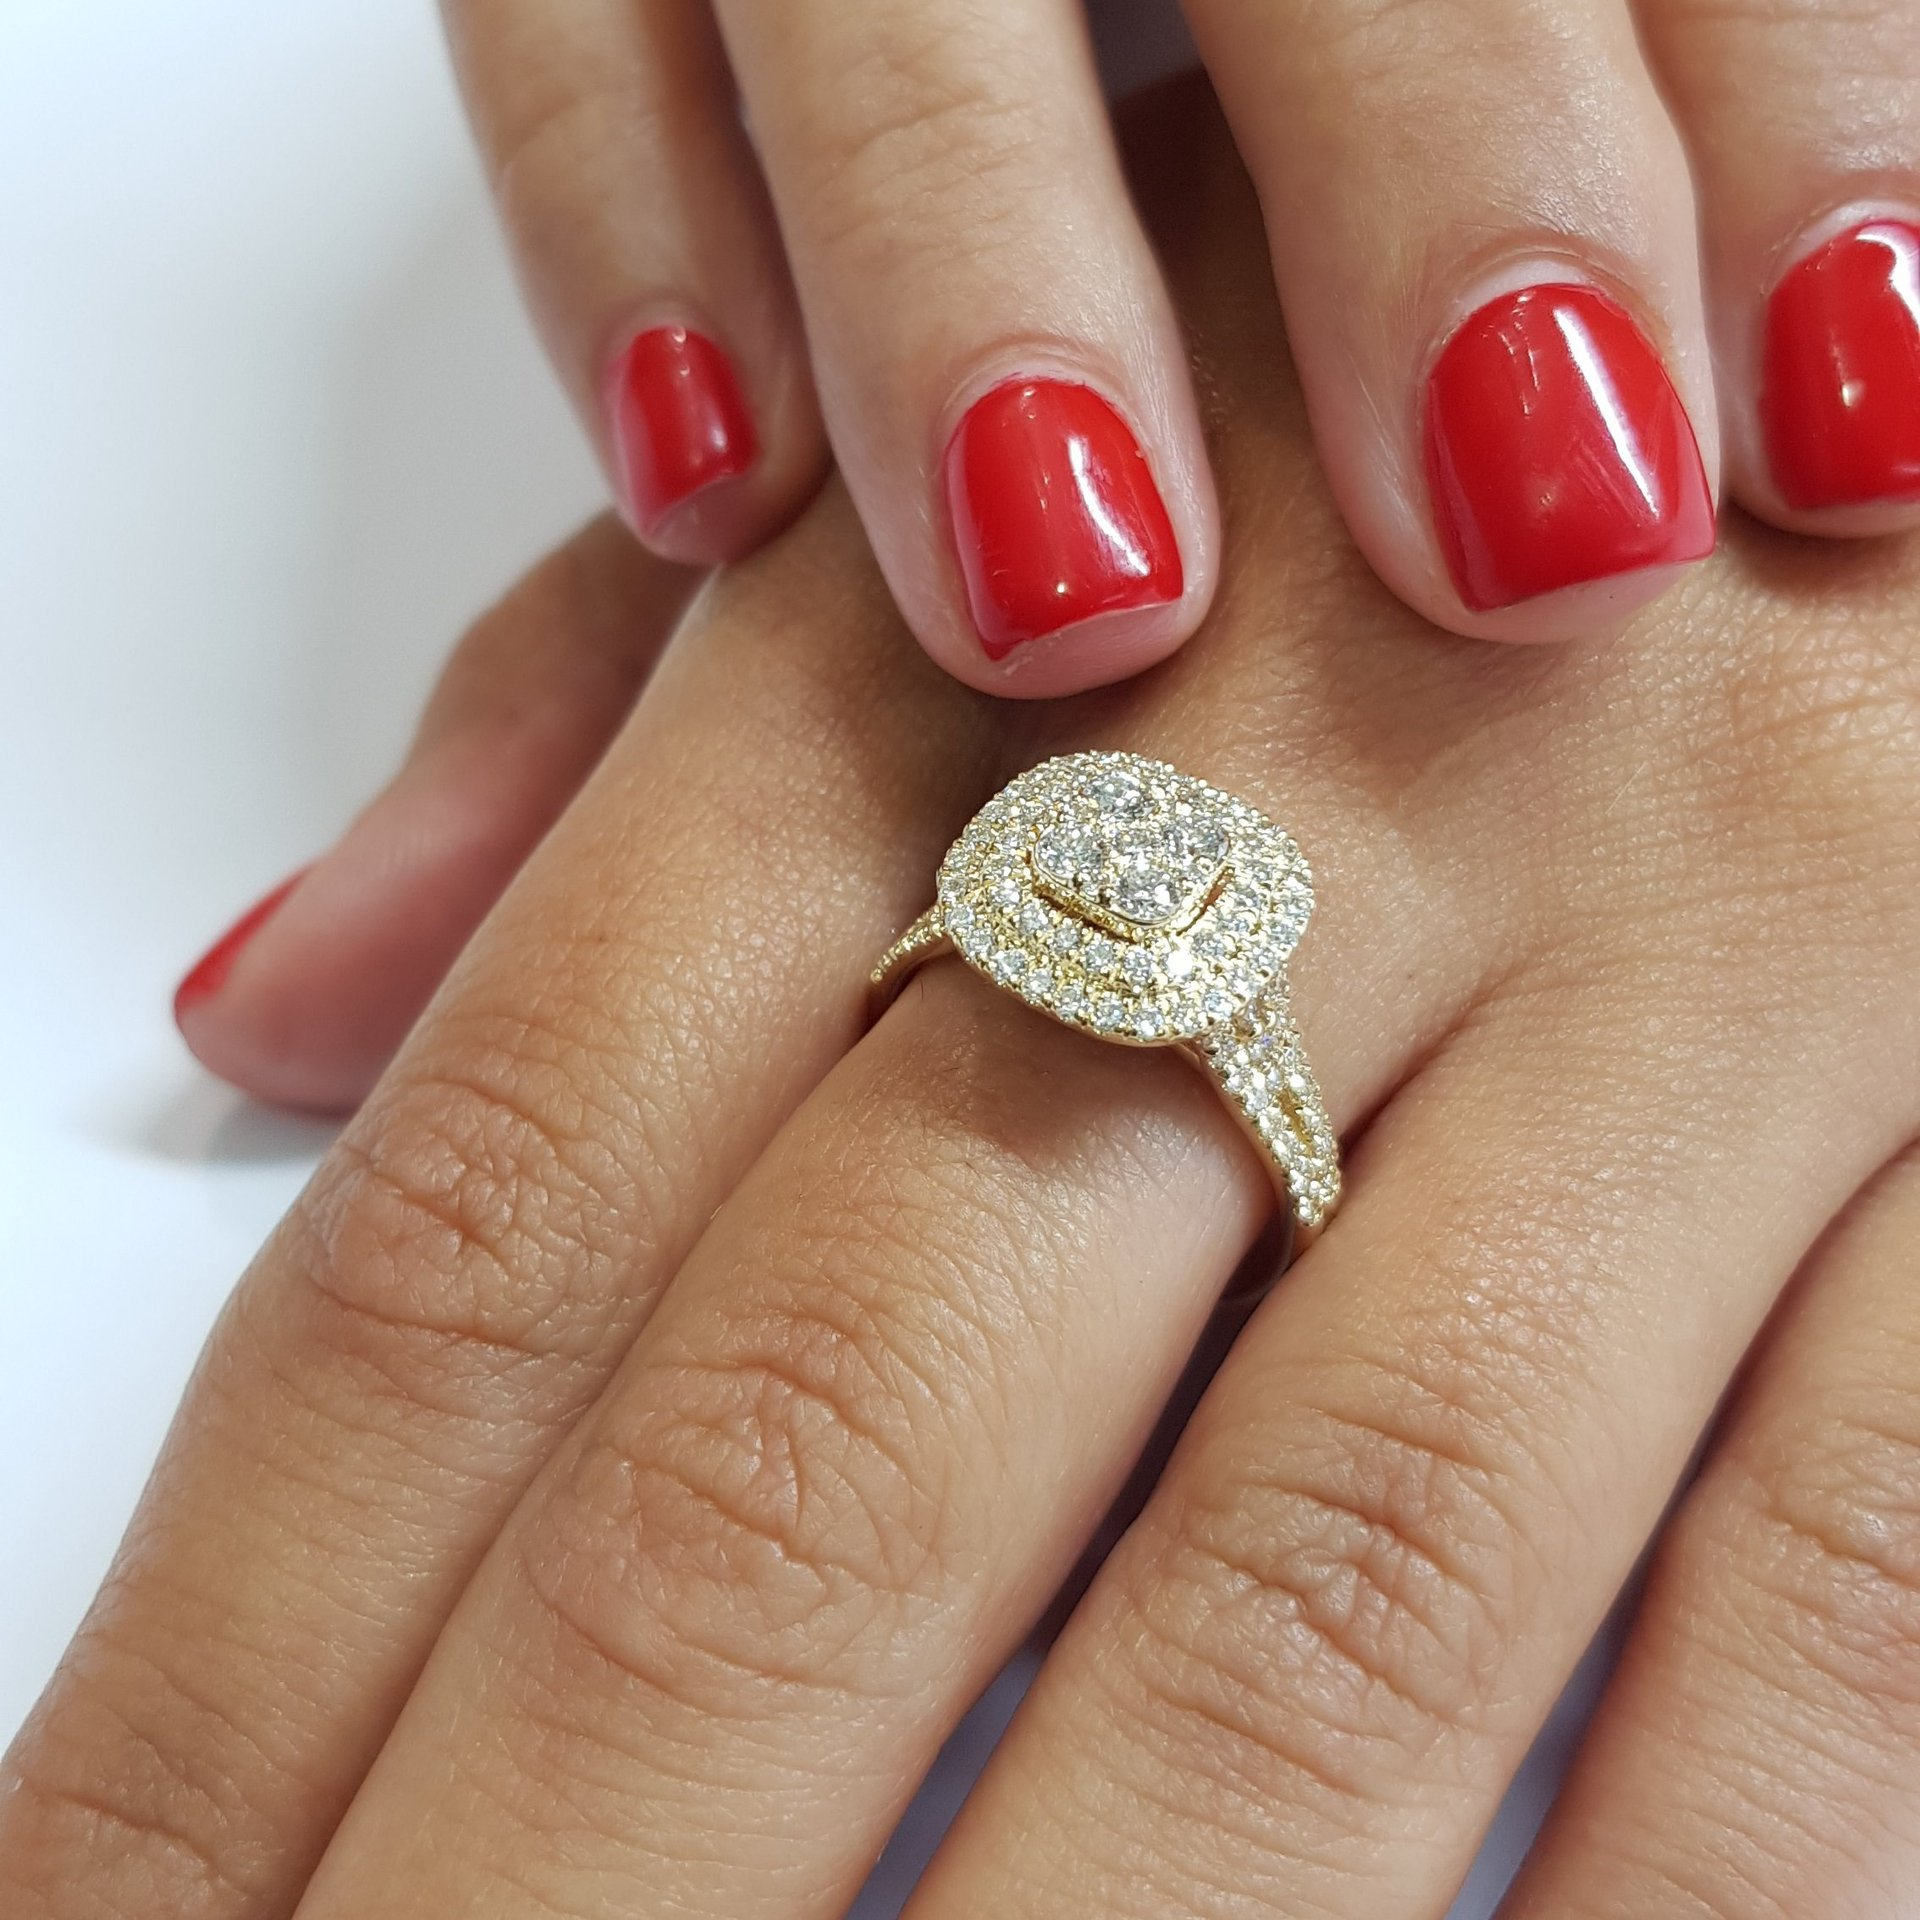 14K Yellow Gold 2 Carats Diamond Ring For Women Men Square Bizuteria Gemstone Jewelry Wedding Party Diamond Rings For Female